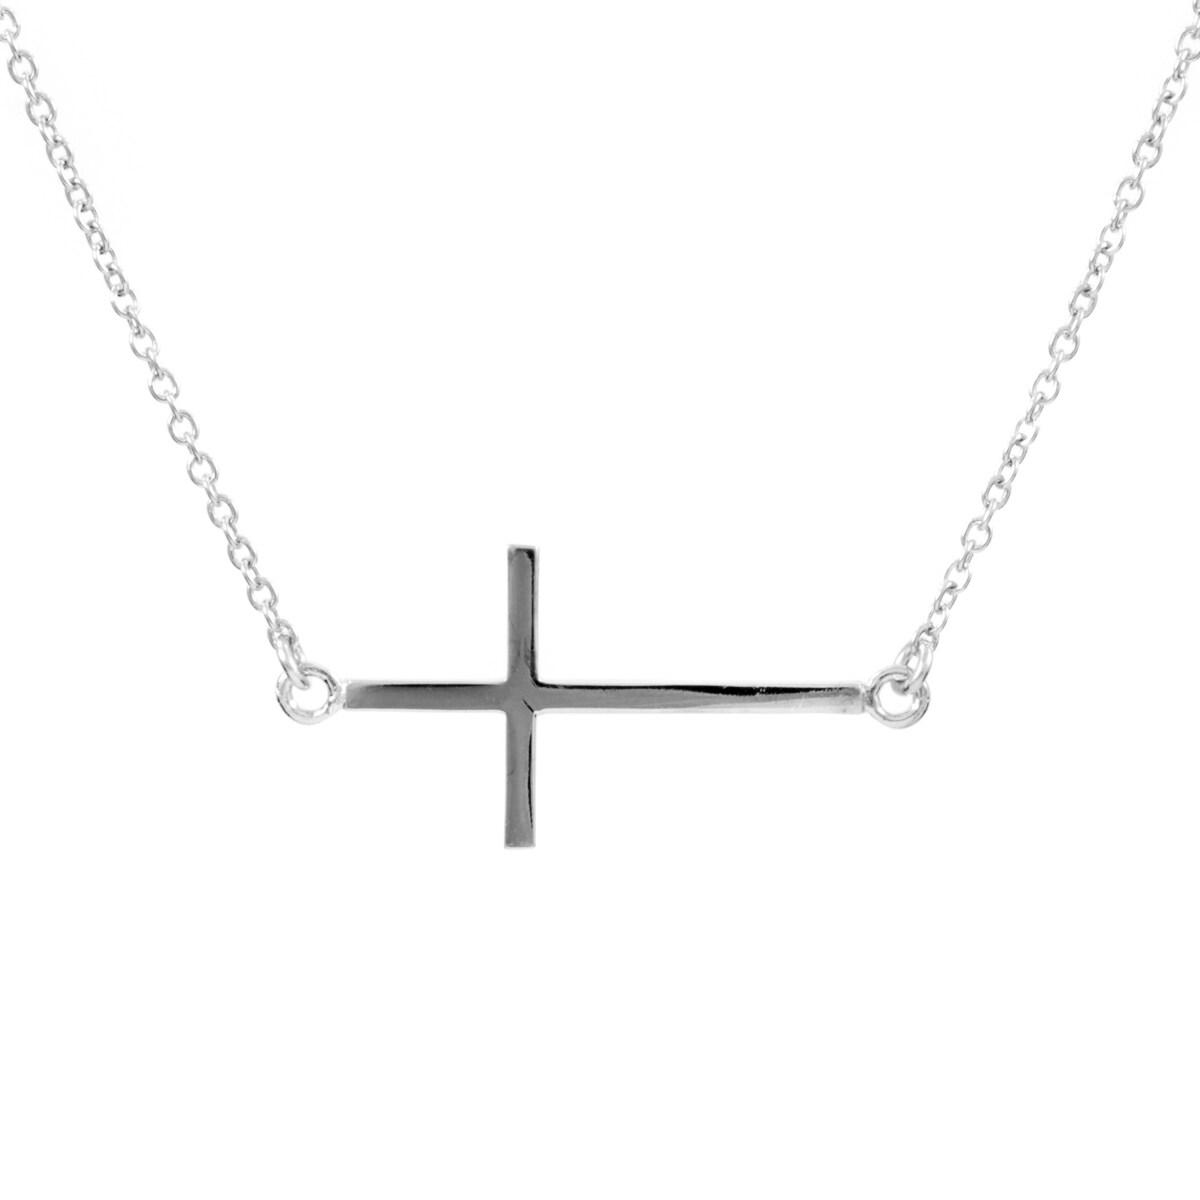 Emitations Cubic Zirconia Sideways Cross Necklace (19 Inc...